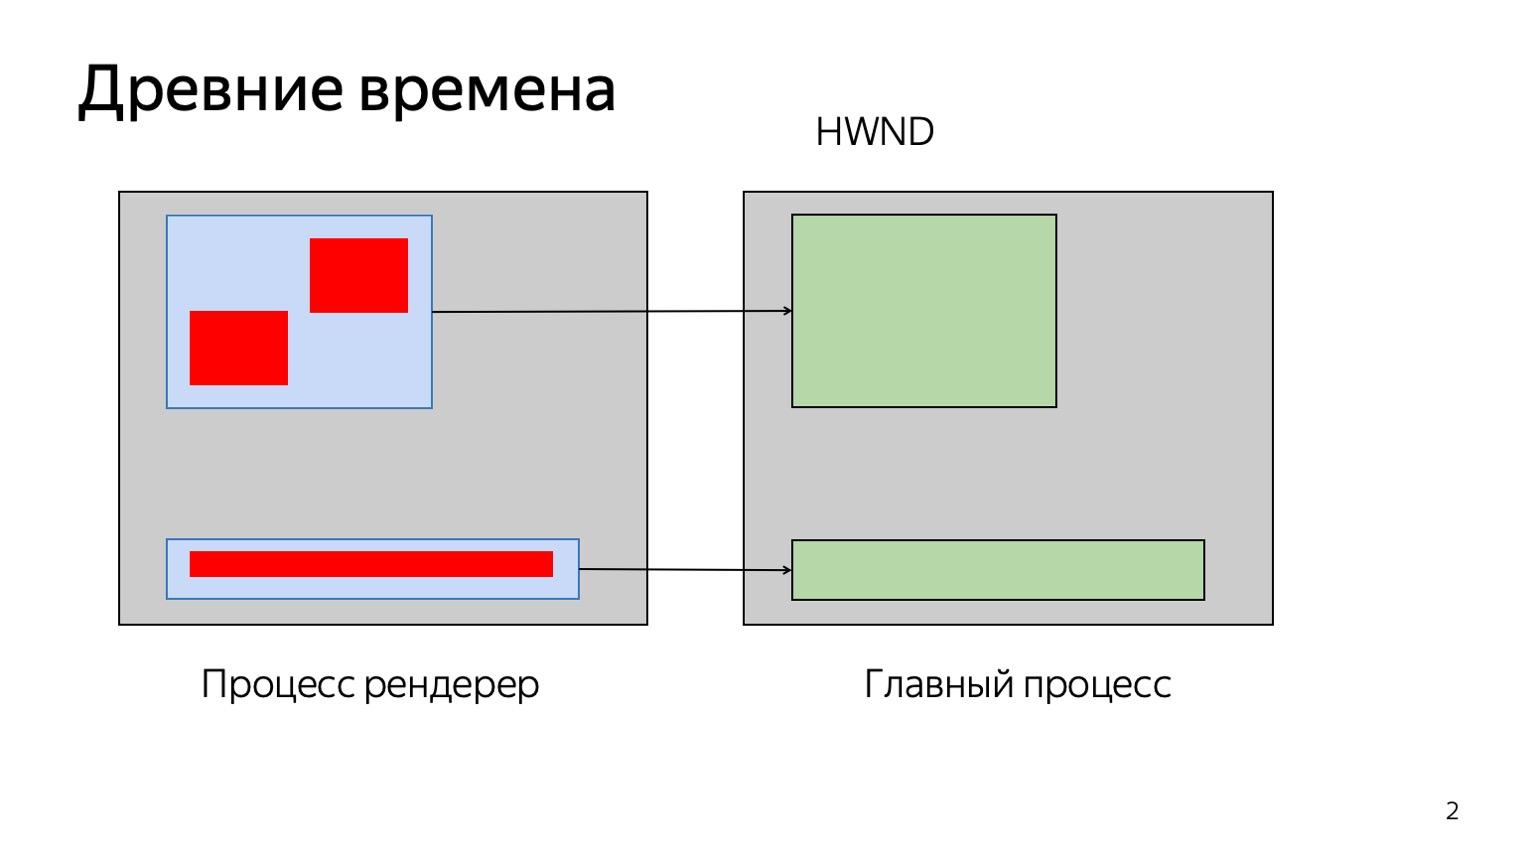 Как рисует браузер. Доклад Яндекса - 3